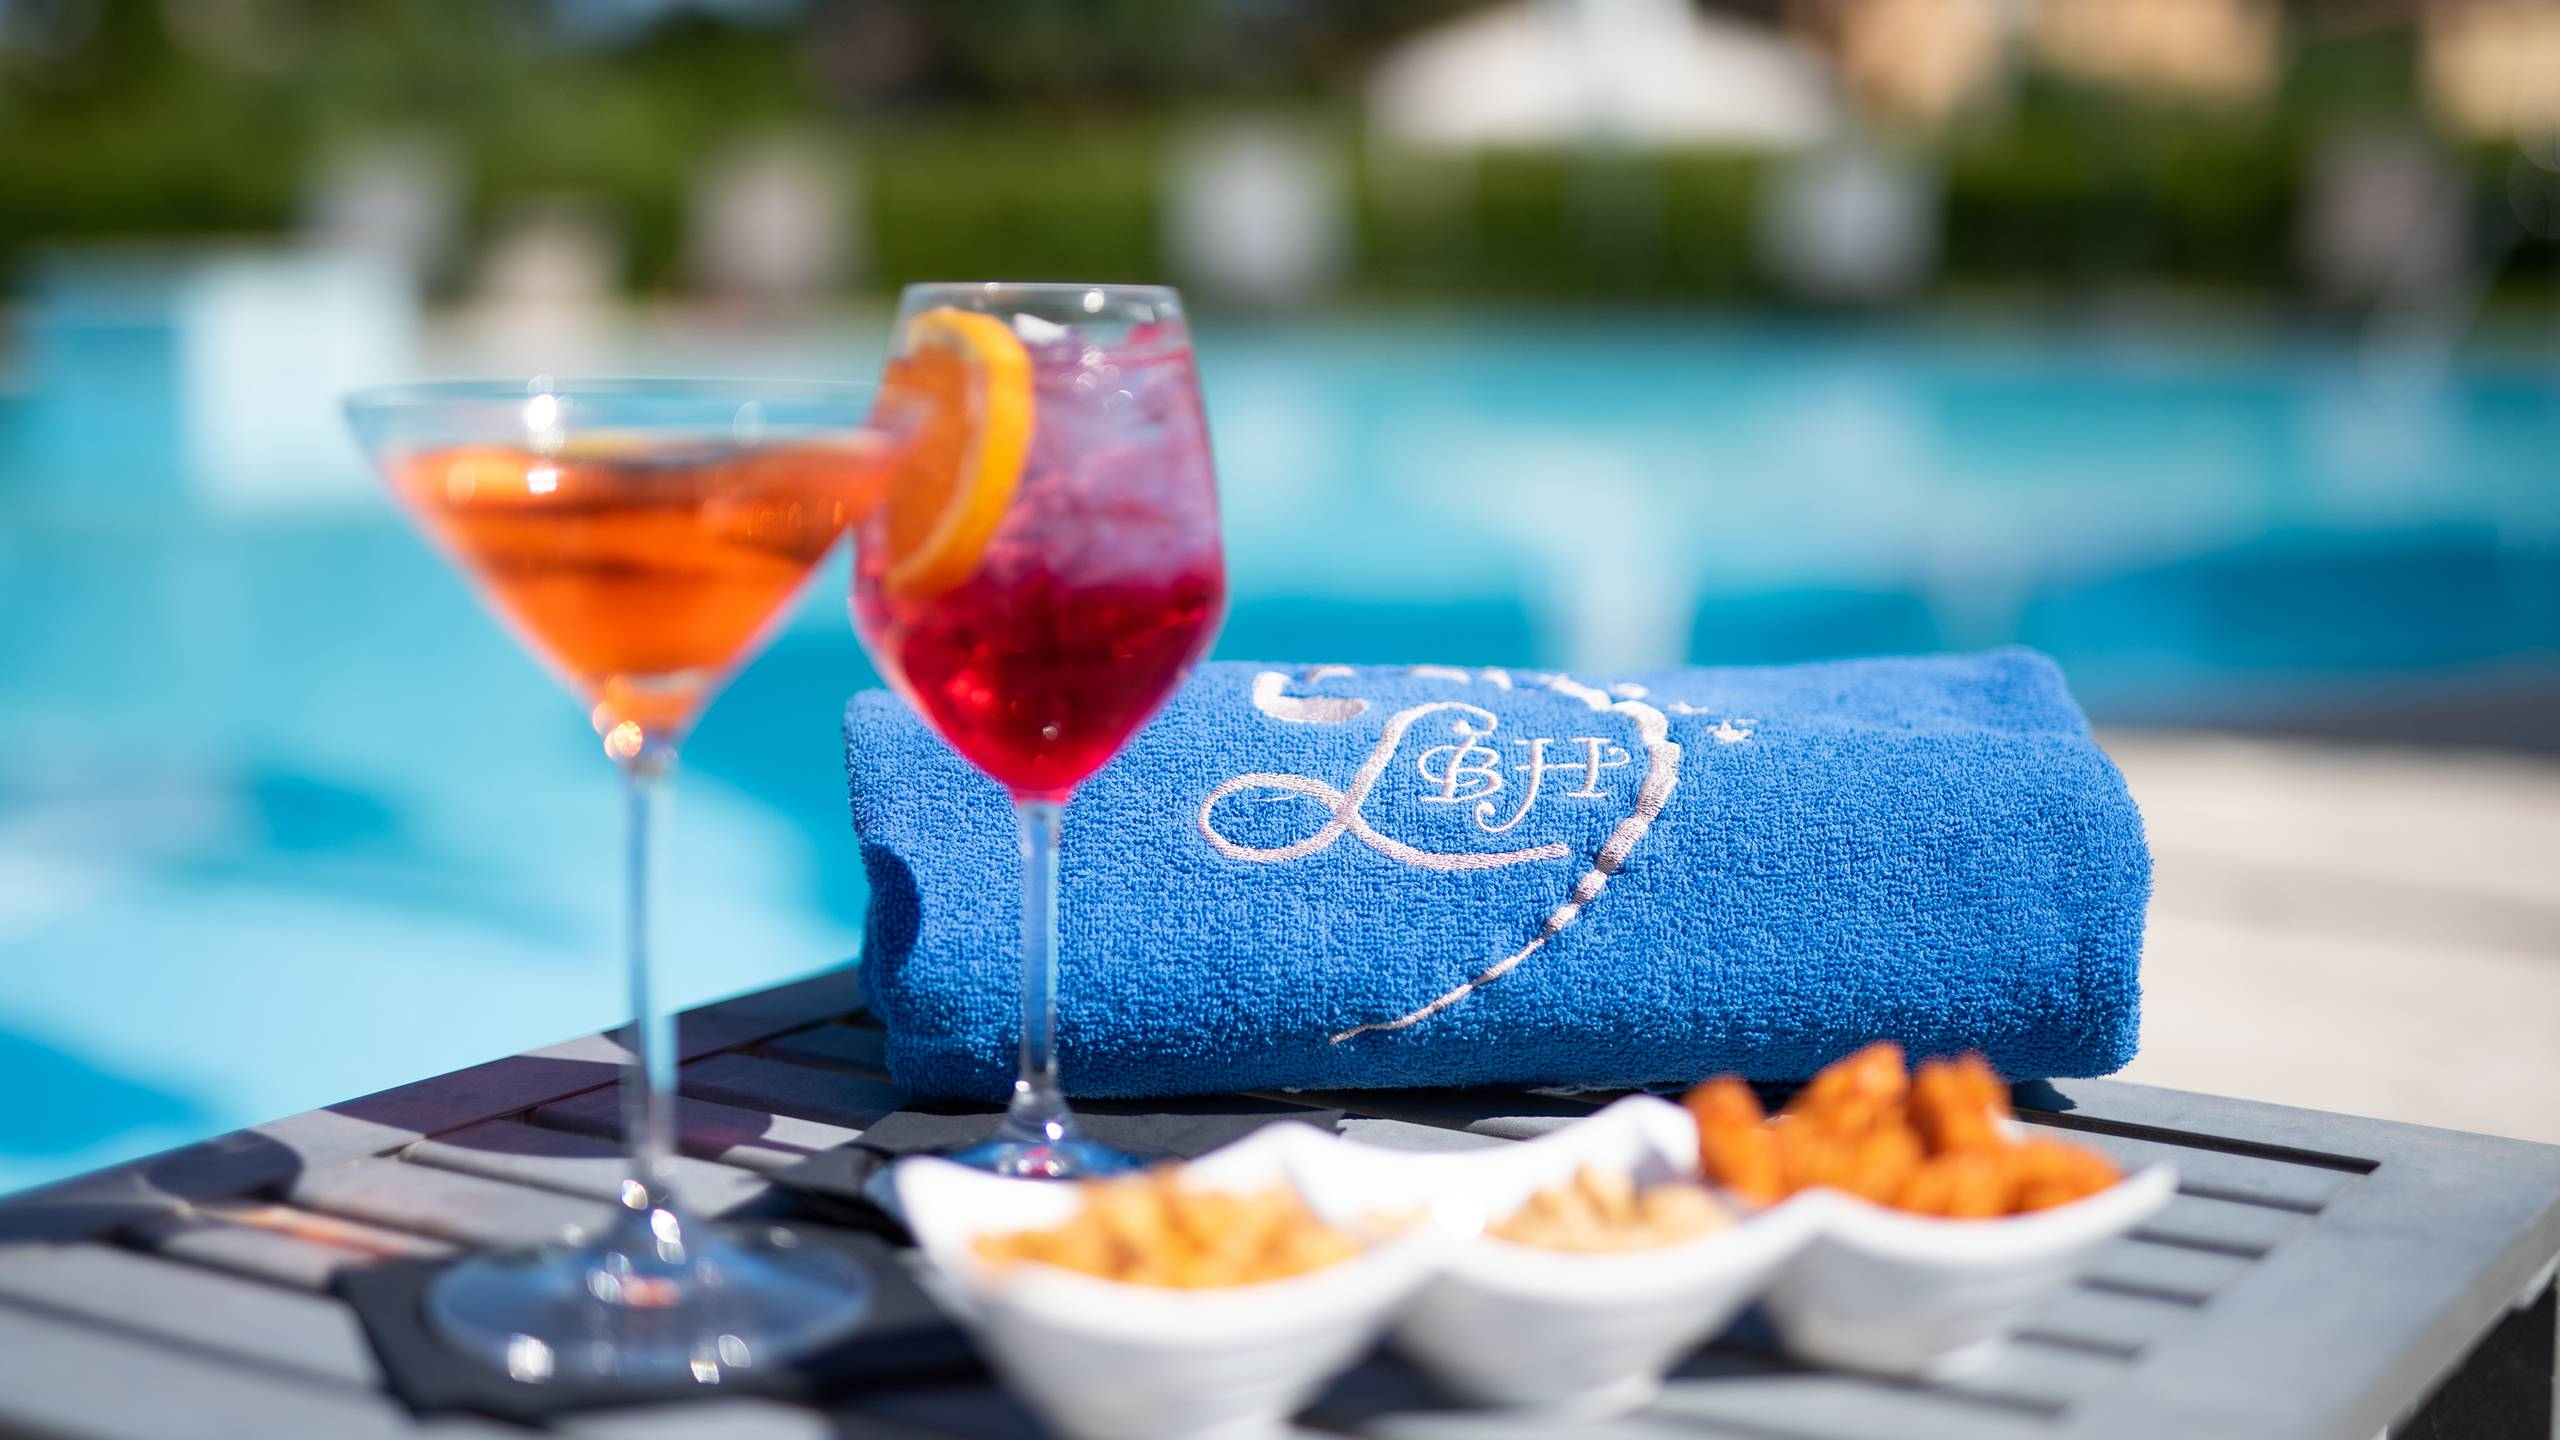 Ludwig-Boutique-Hotel-Bolsena-Details-Schwimmbad-Aperitif-CRI4656